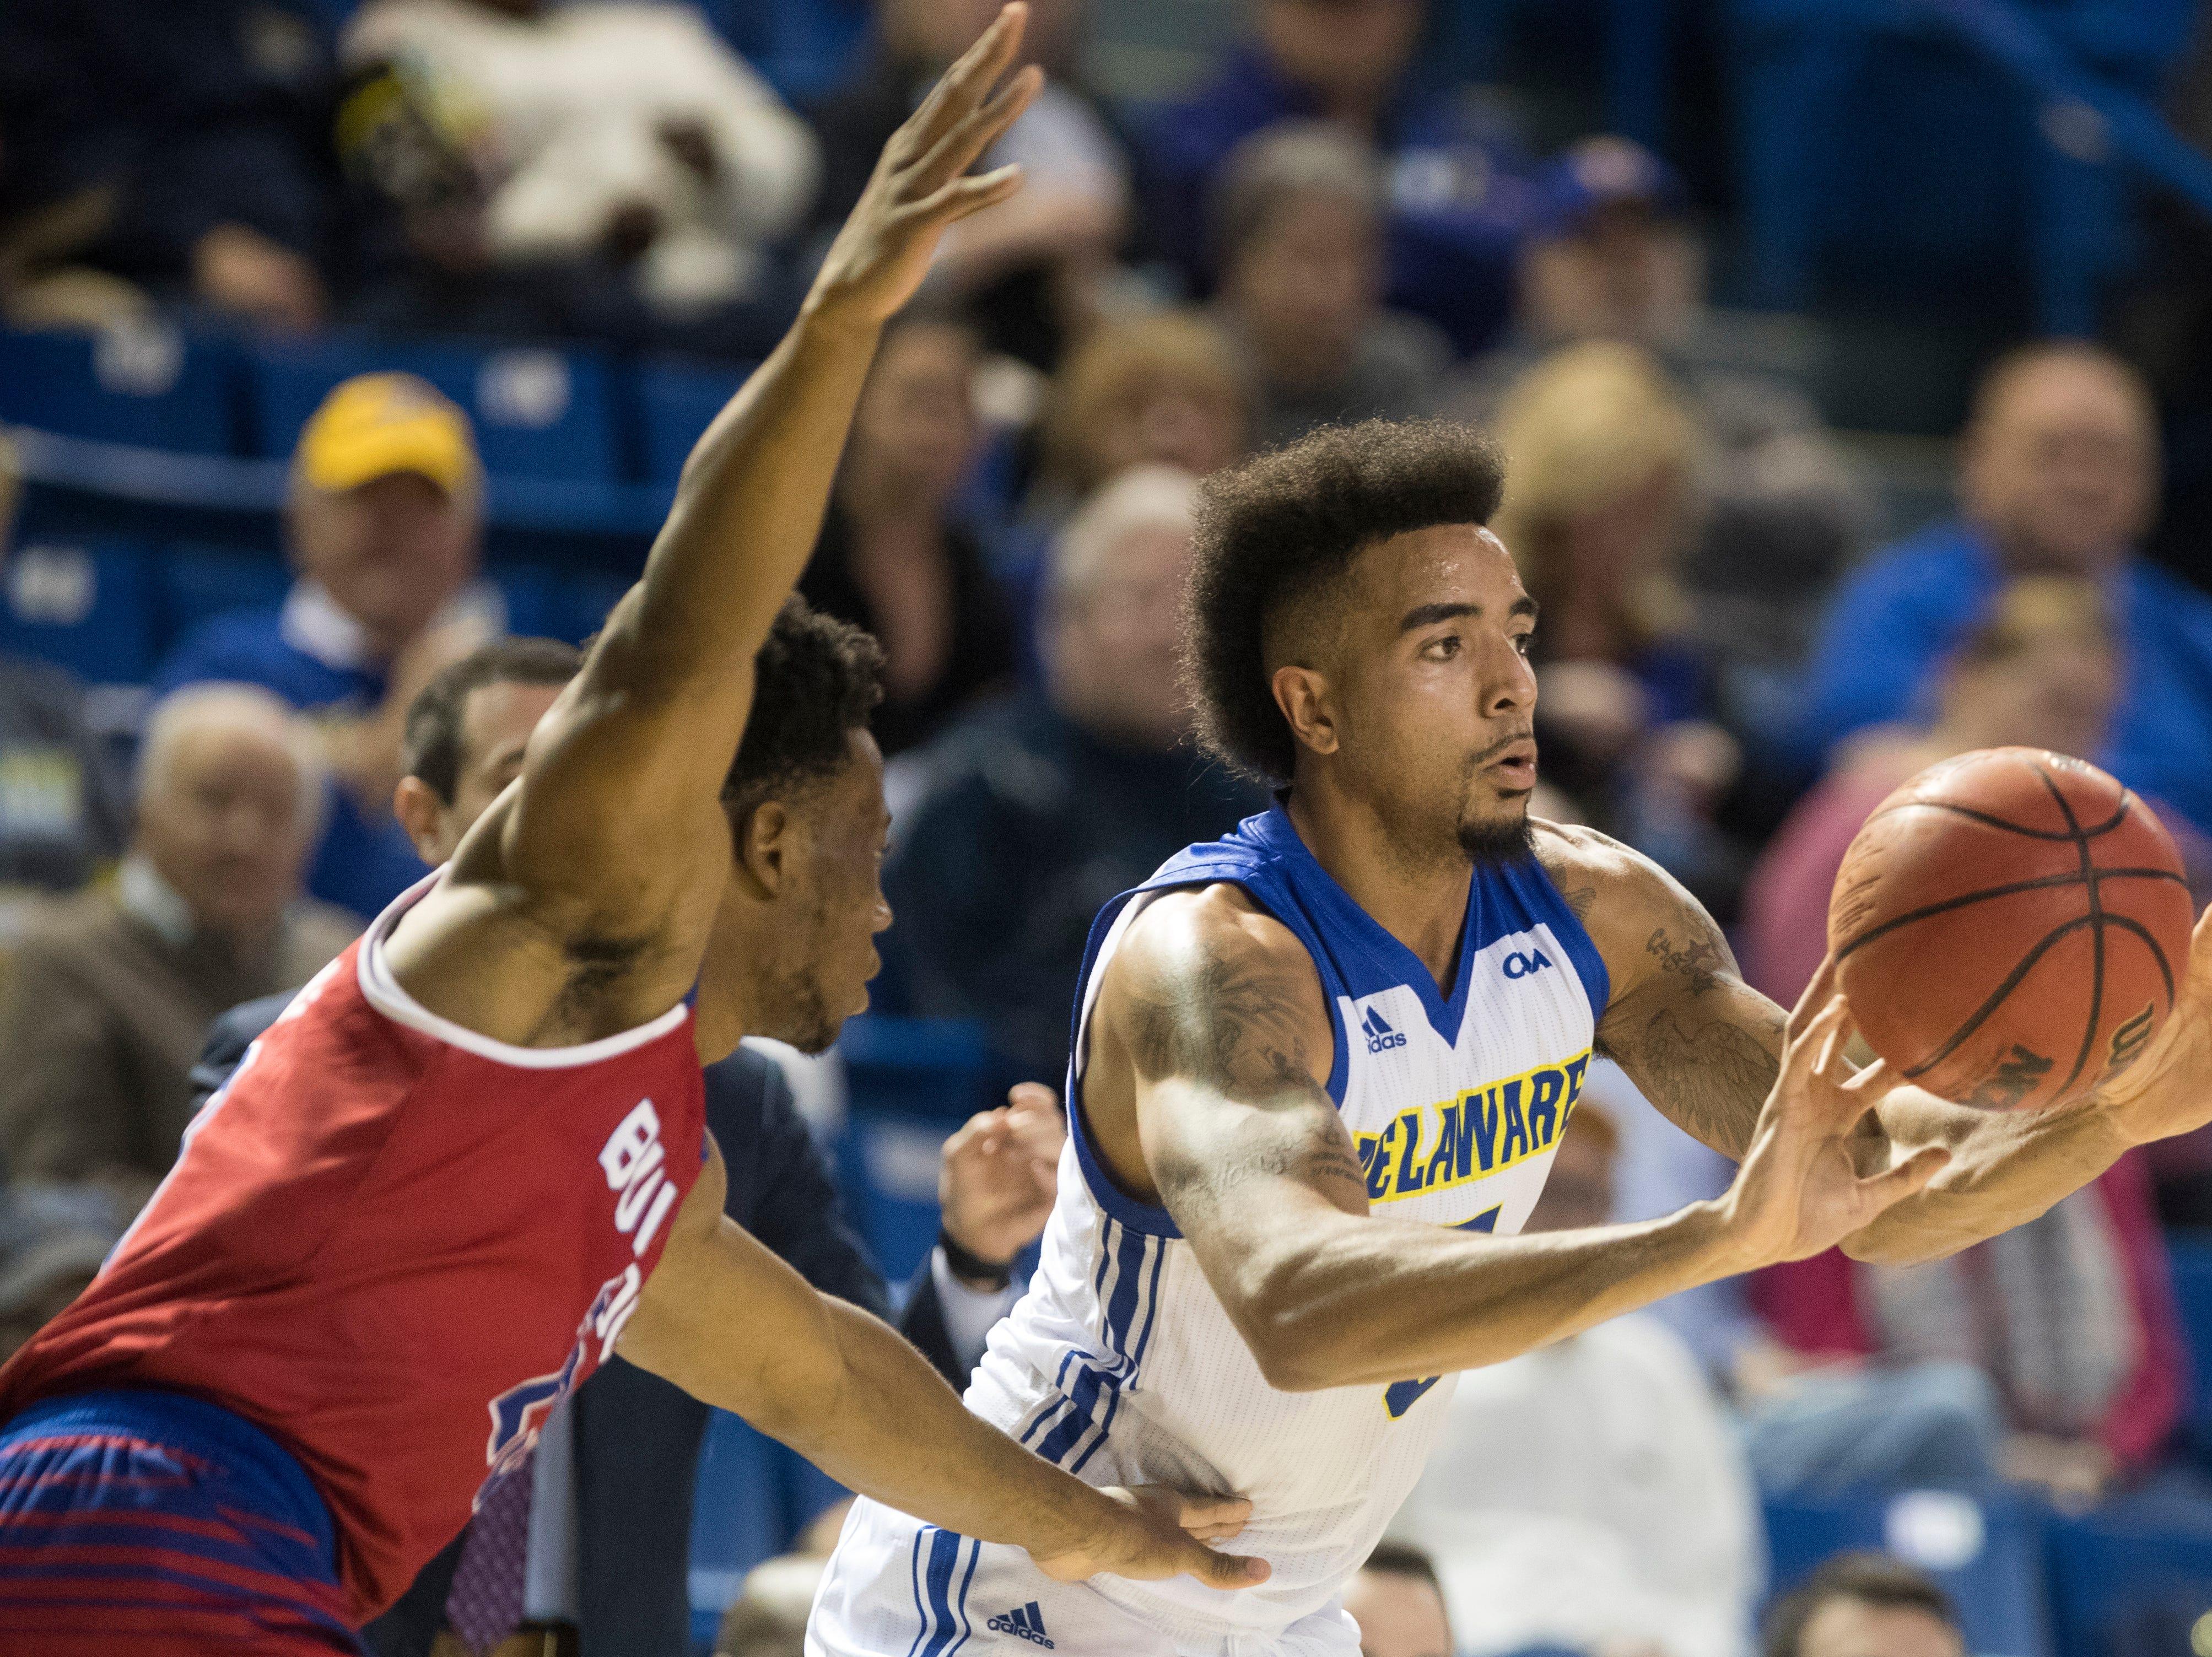 Delaware's Eric Carter passes to a teammate Monday at the Bob Carpenter Center. Delaware defeated Louisiana Tech 75-71.